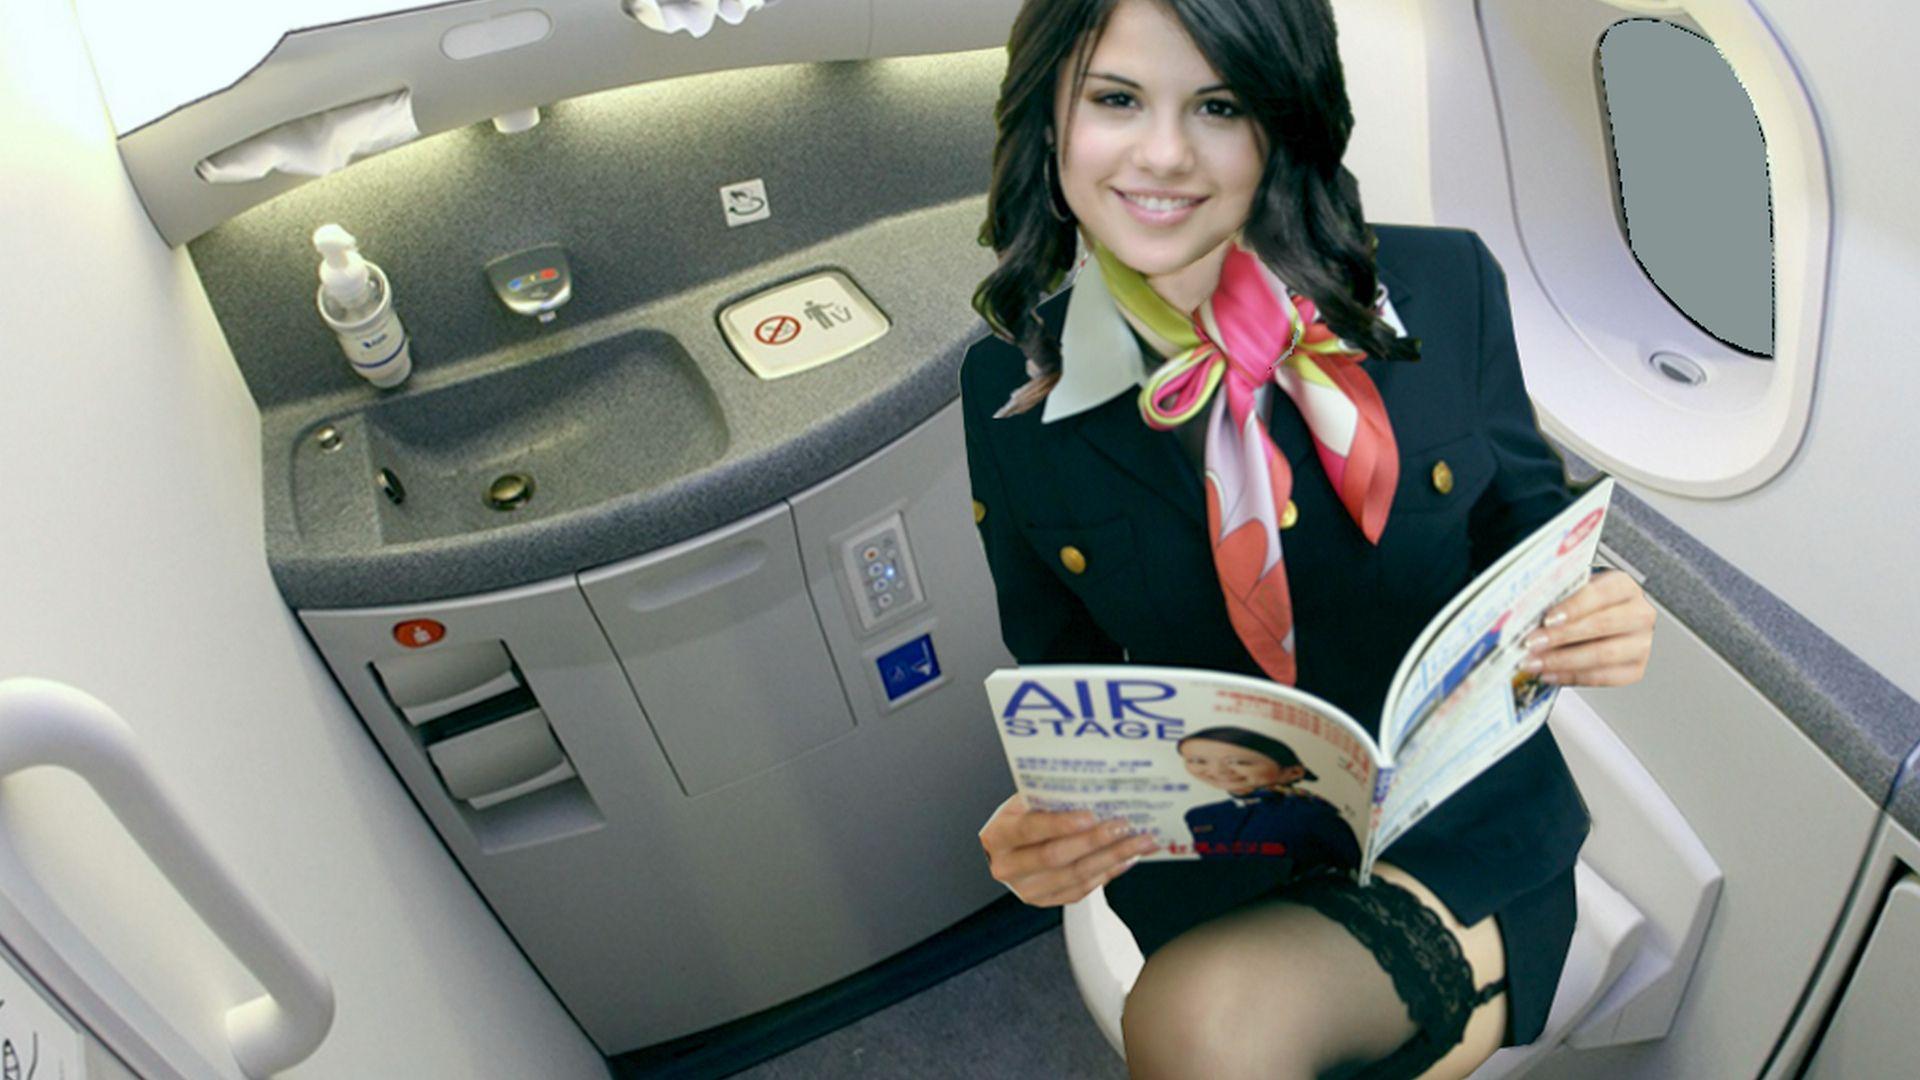 Фото стюардесса ххх, Голые стюардессы - Лучшее фото 21 фотография